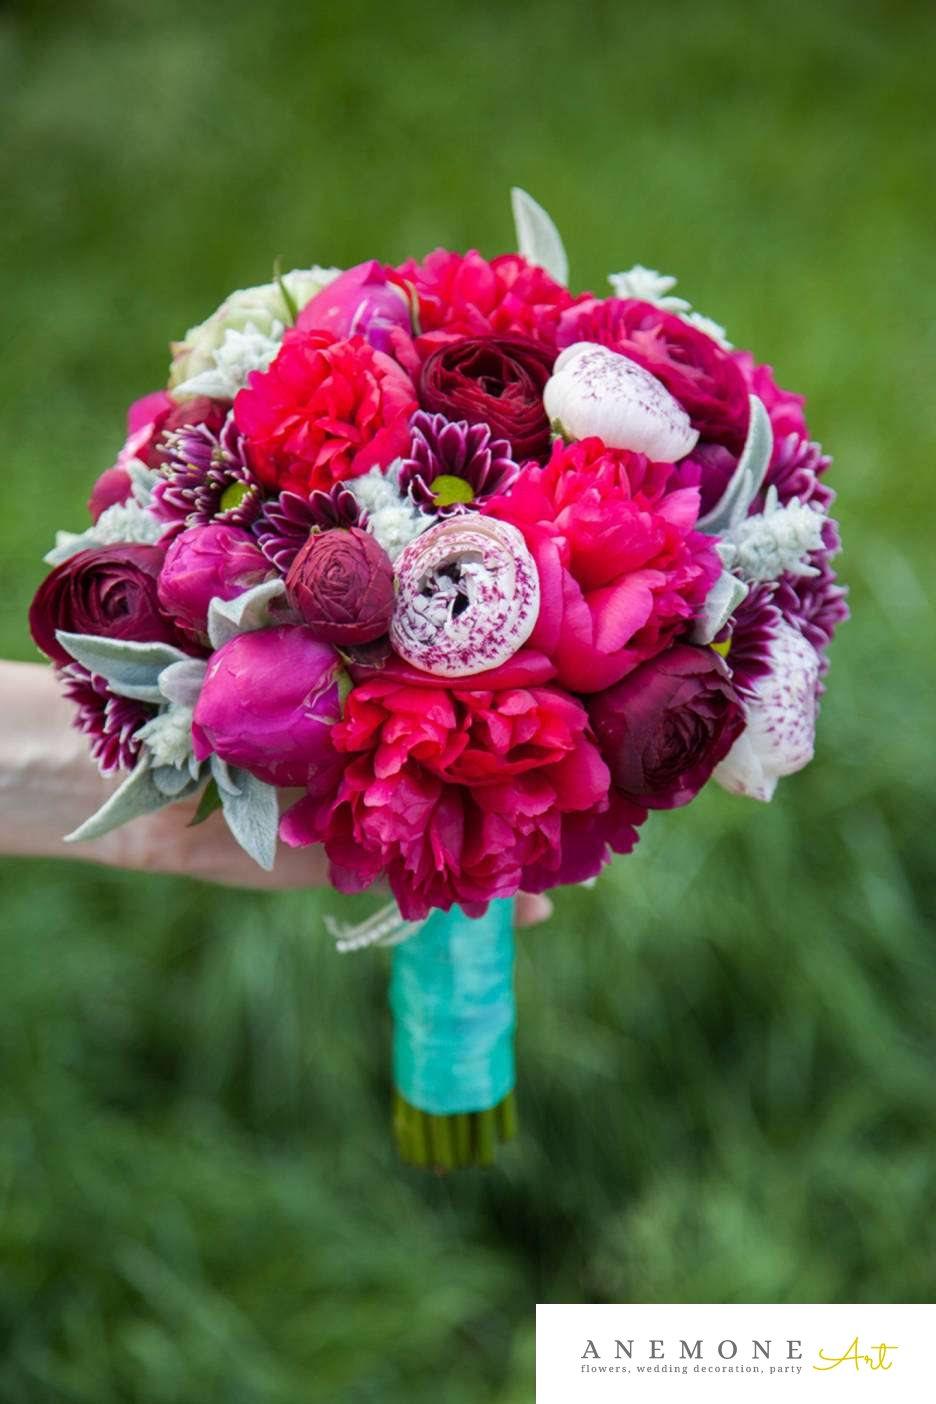 Poza, foto cu Flori de nunta buchet mireasa, bujori, maner buchet, ranunculus in Arad, Timisoara, Oradea (wedding flowers, bouquets) nunta Arad, Timisoara, Oradea